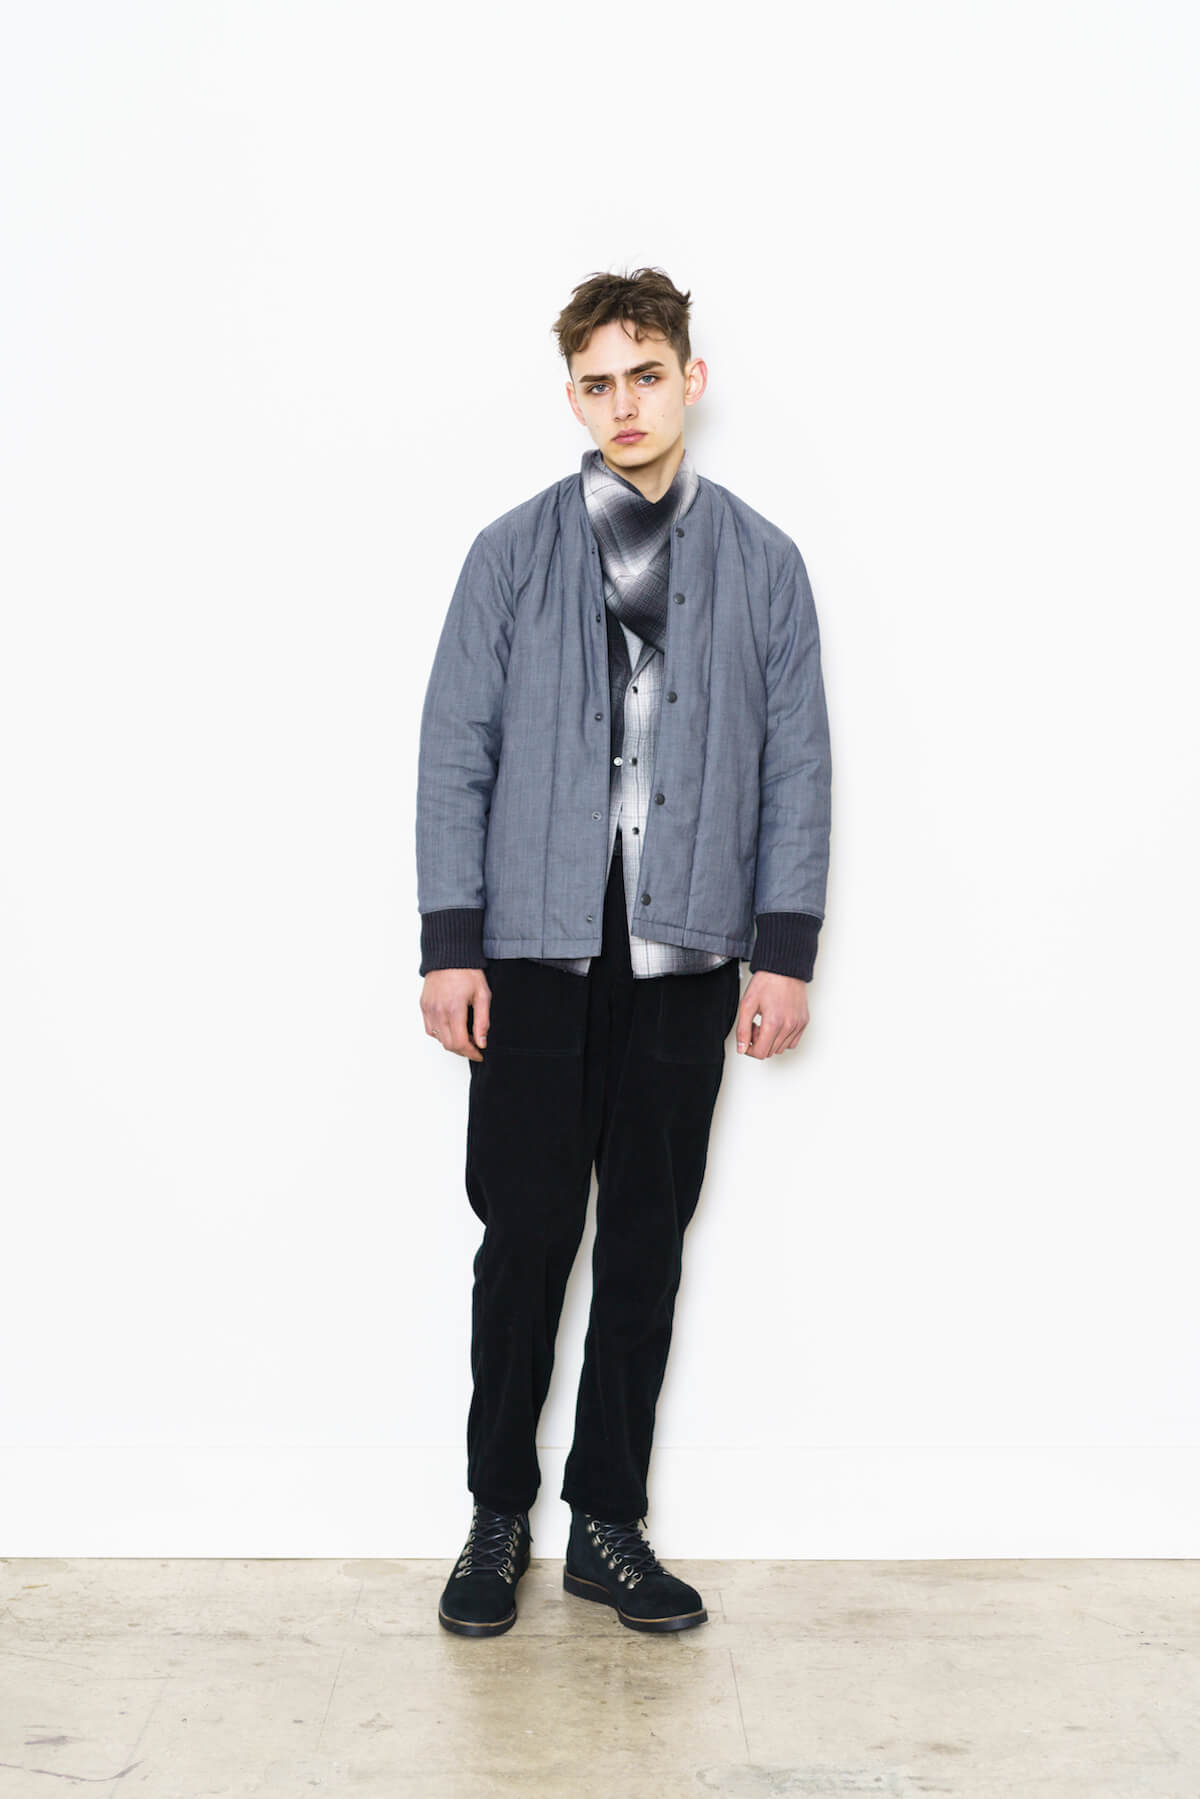 Black(黒/影)×Blank(白/空白)。ブランド「BLANCK」2018AWルックが公開! fashion_blanck_11